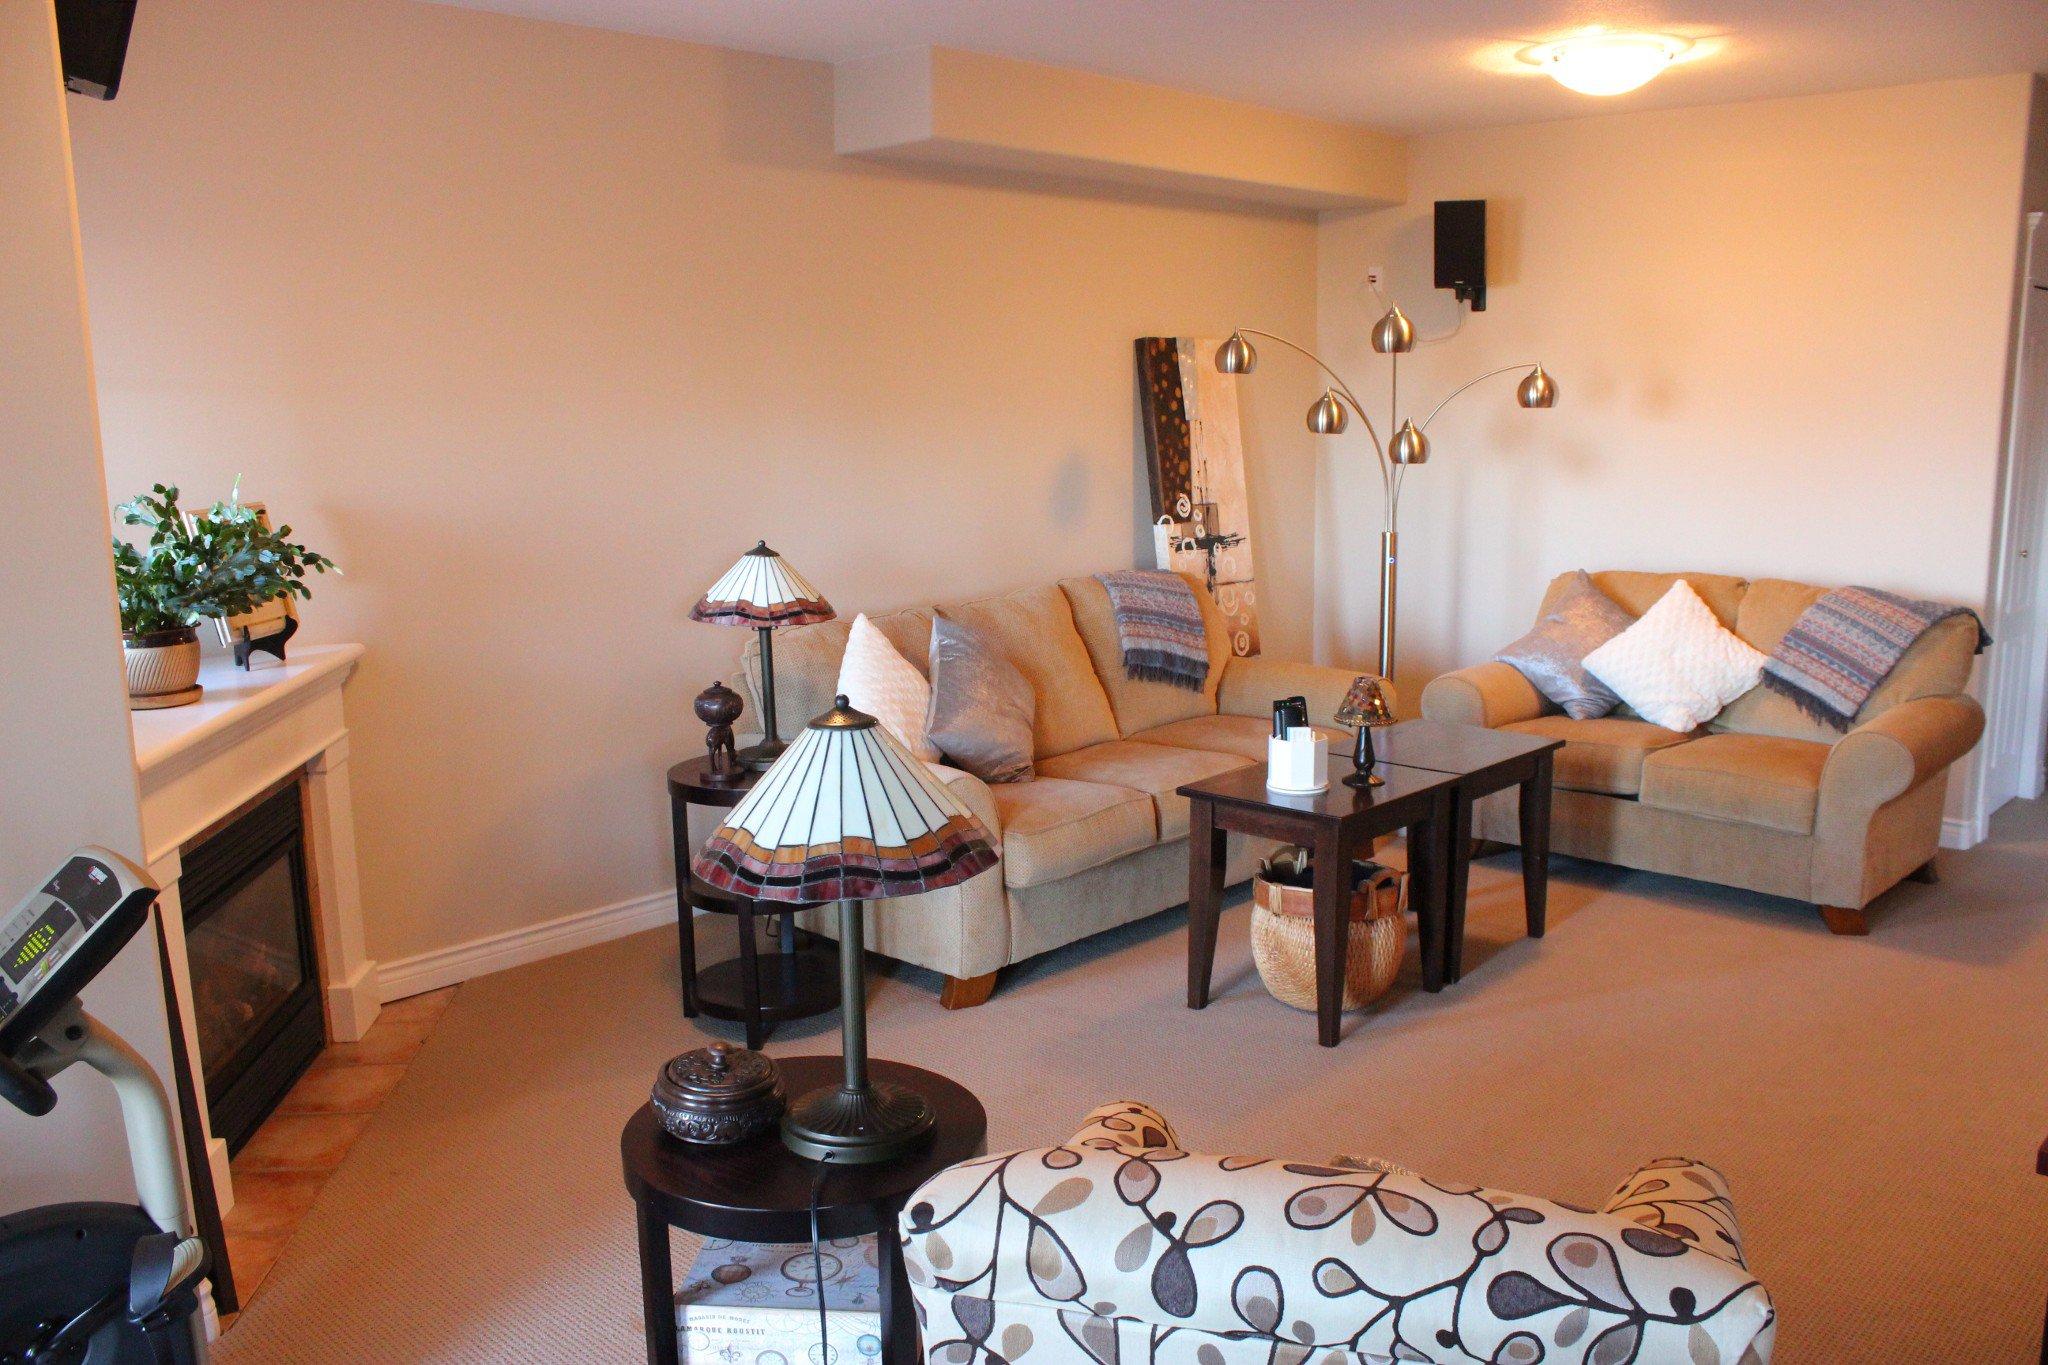 Photo 26: Photos: 101 875 Sahali Terrace in Kamloops: Lower Sahali Townhouse for sale : MLS®# 154556